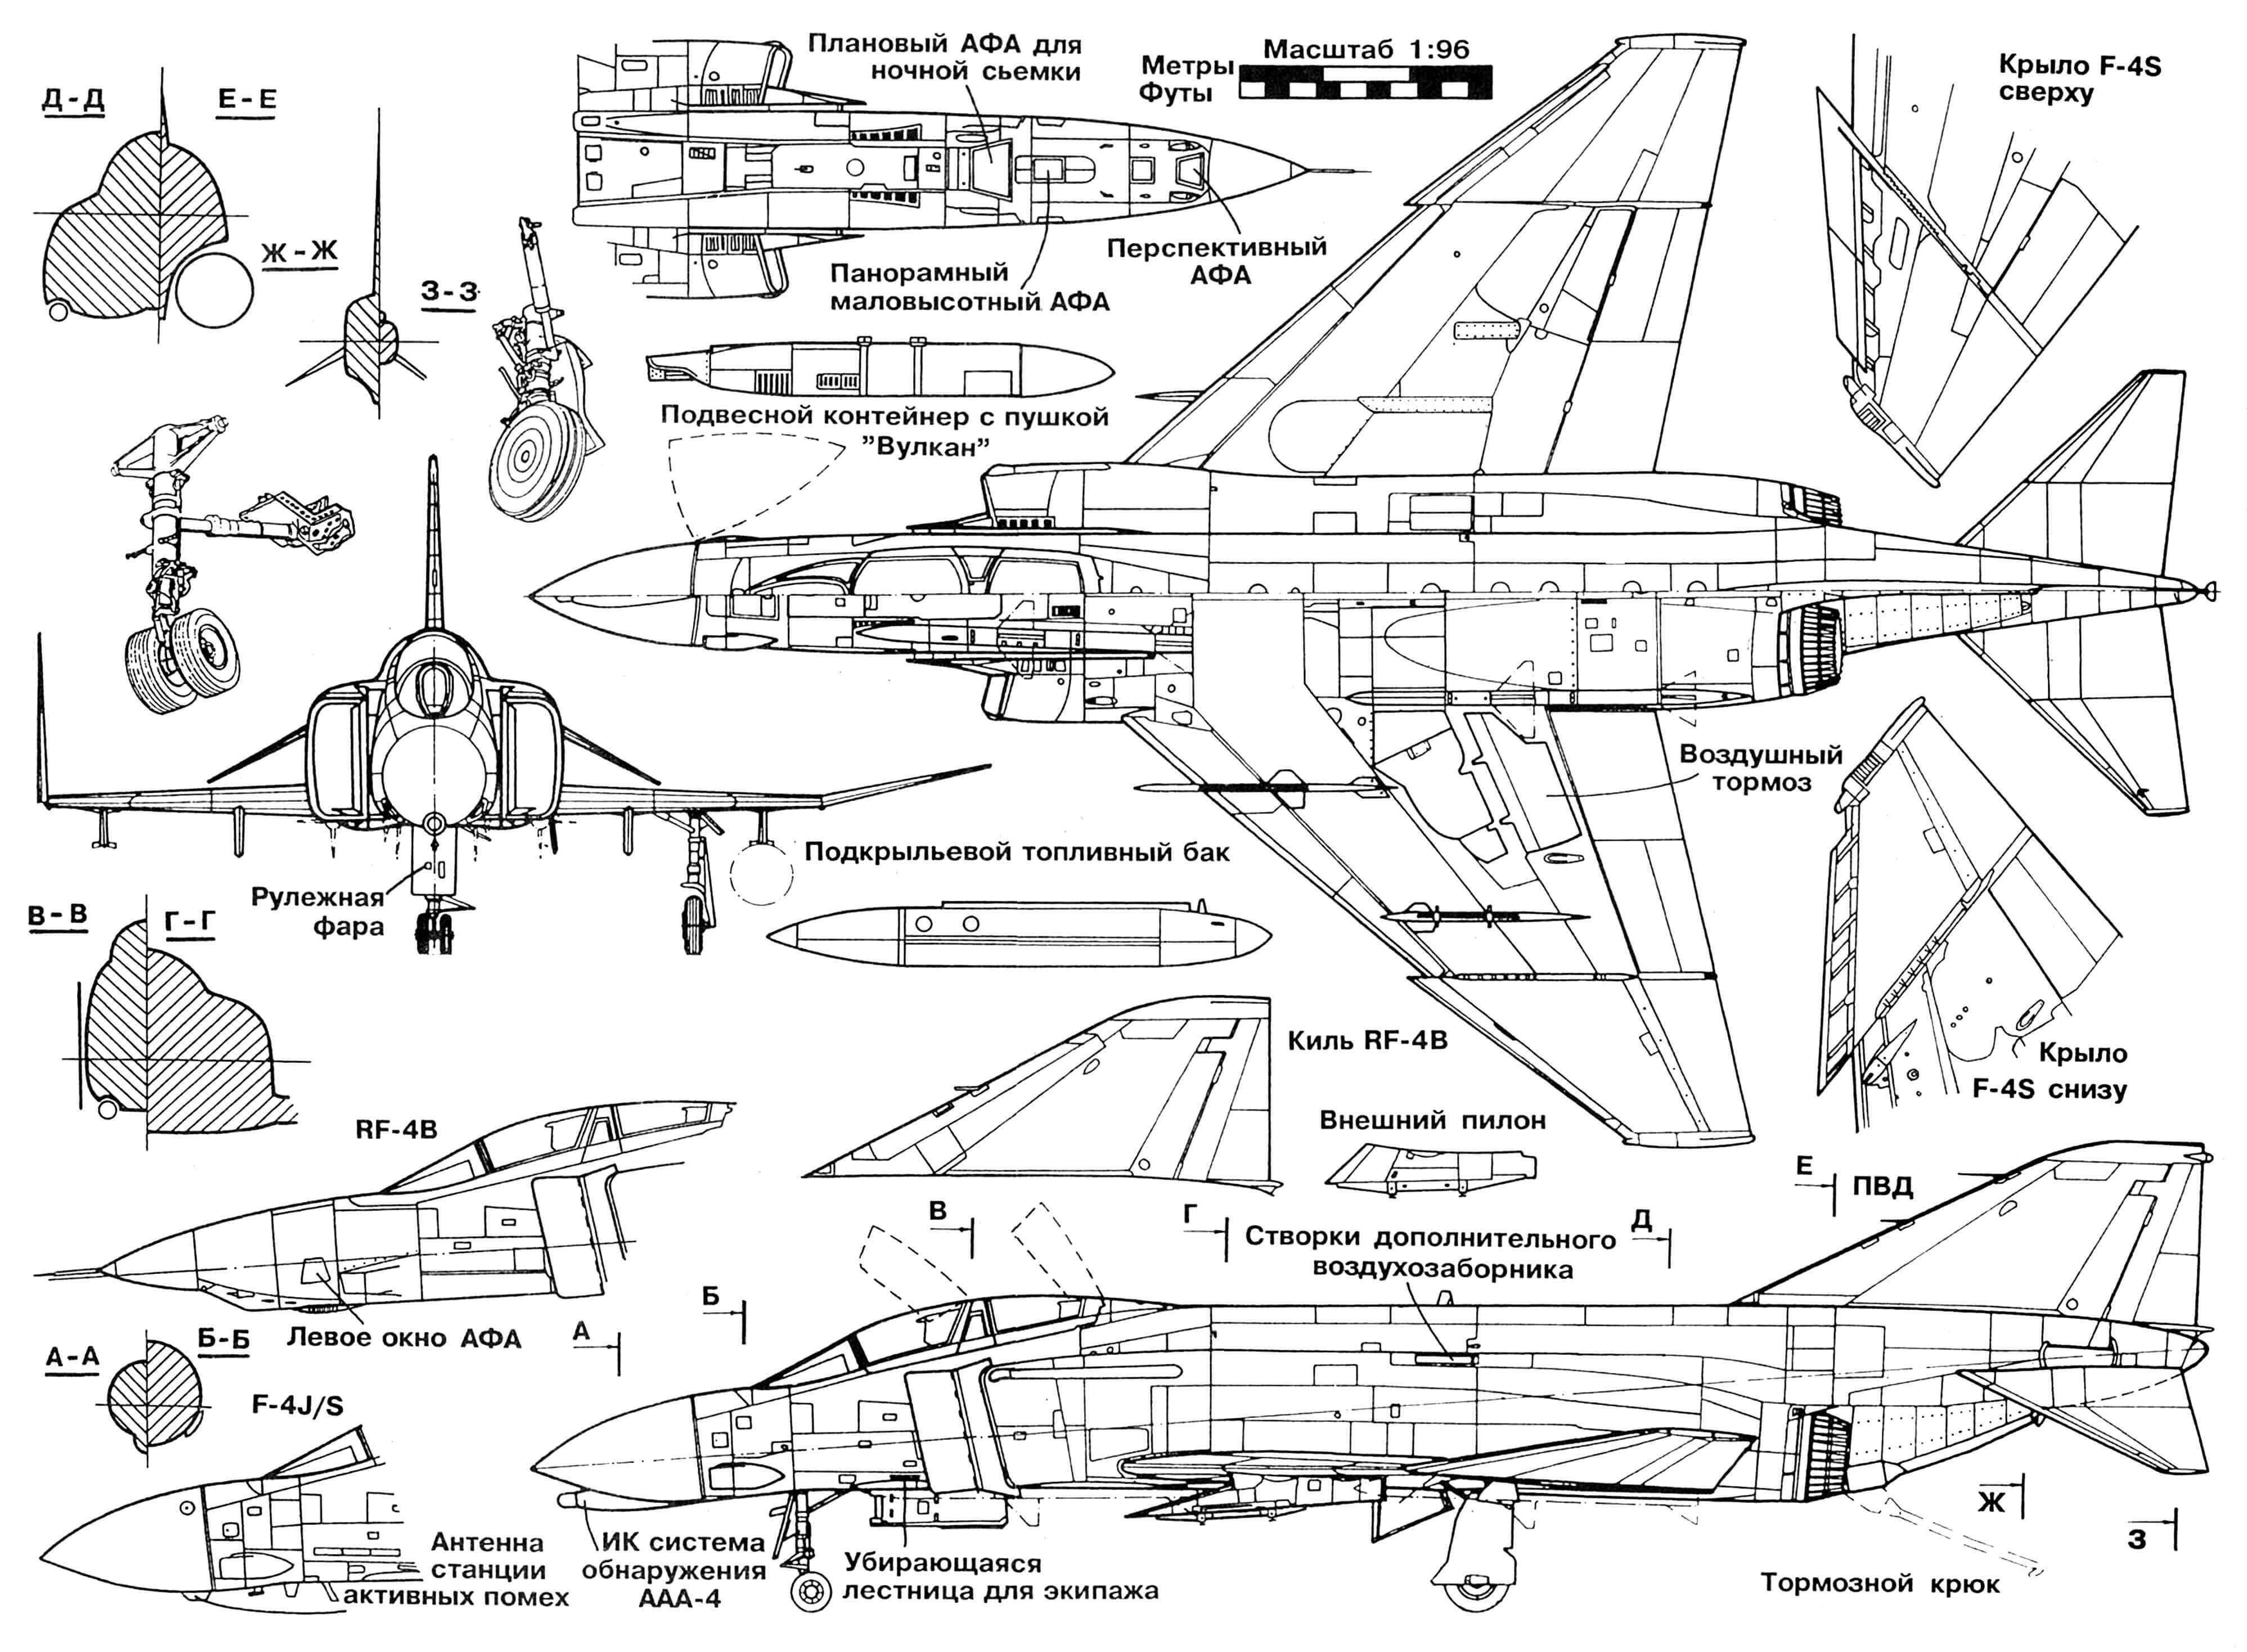 McDonnell F-4N Phantom-2